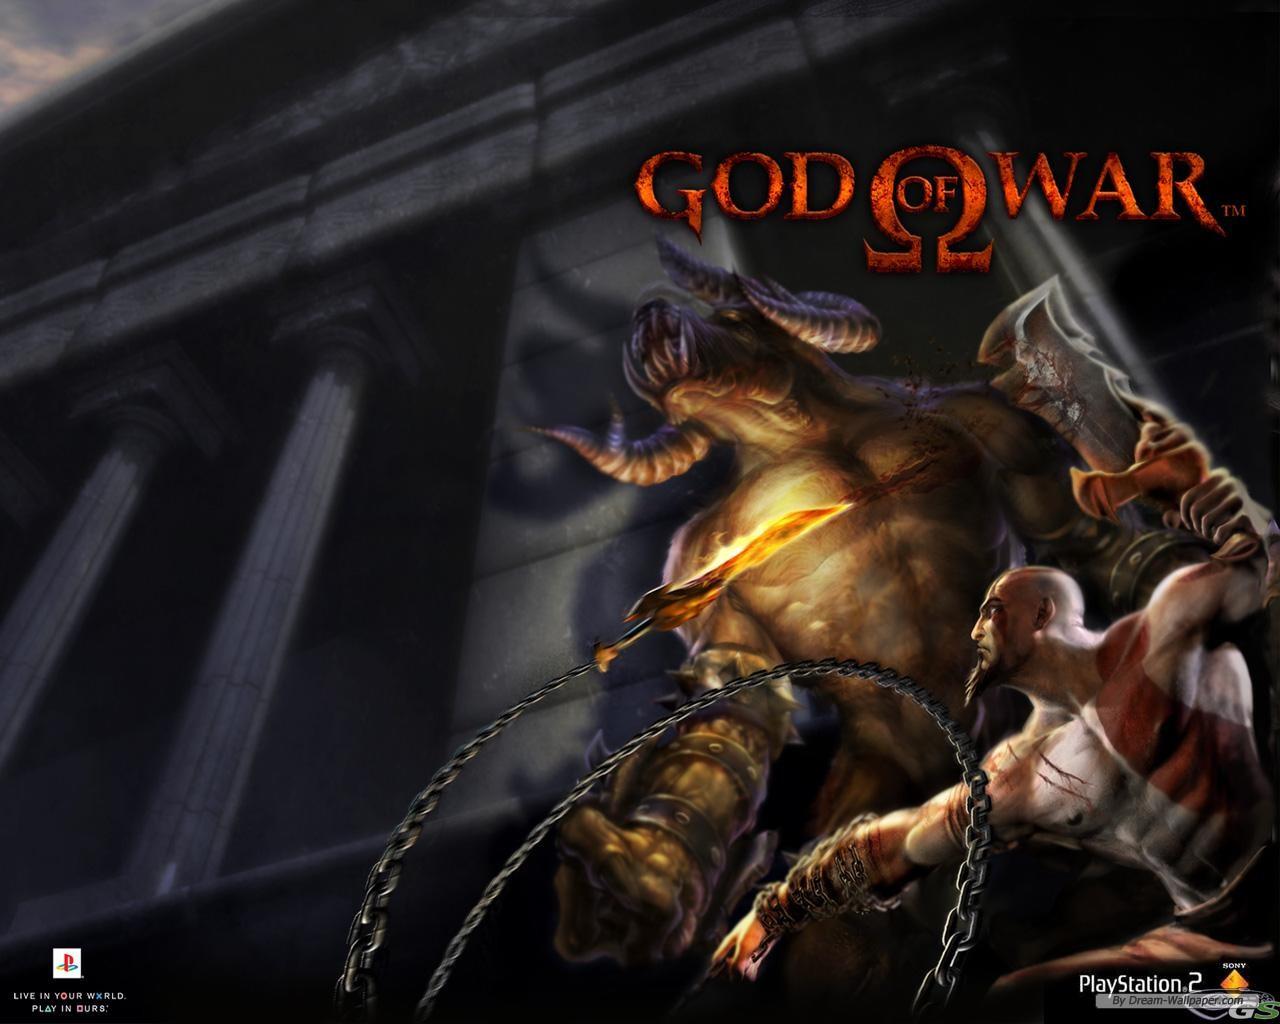 god of war 1 wallpaper hd - photo #1